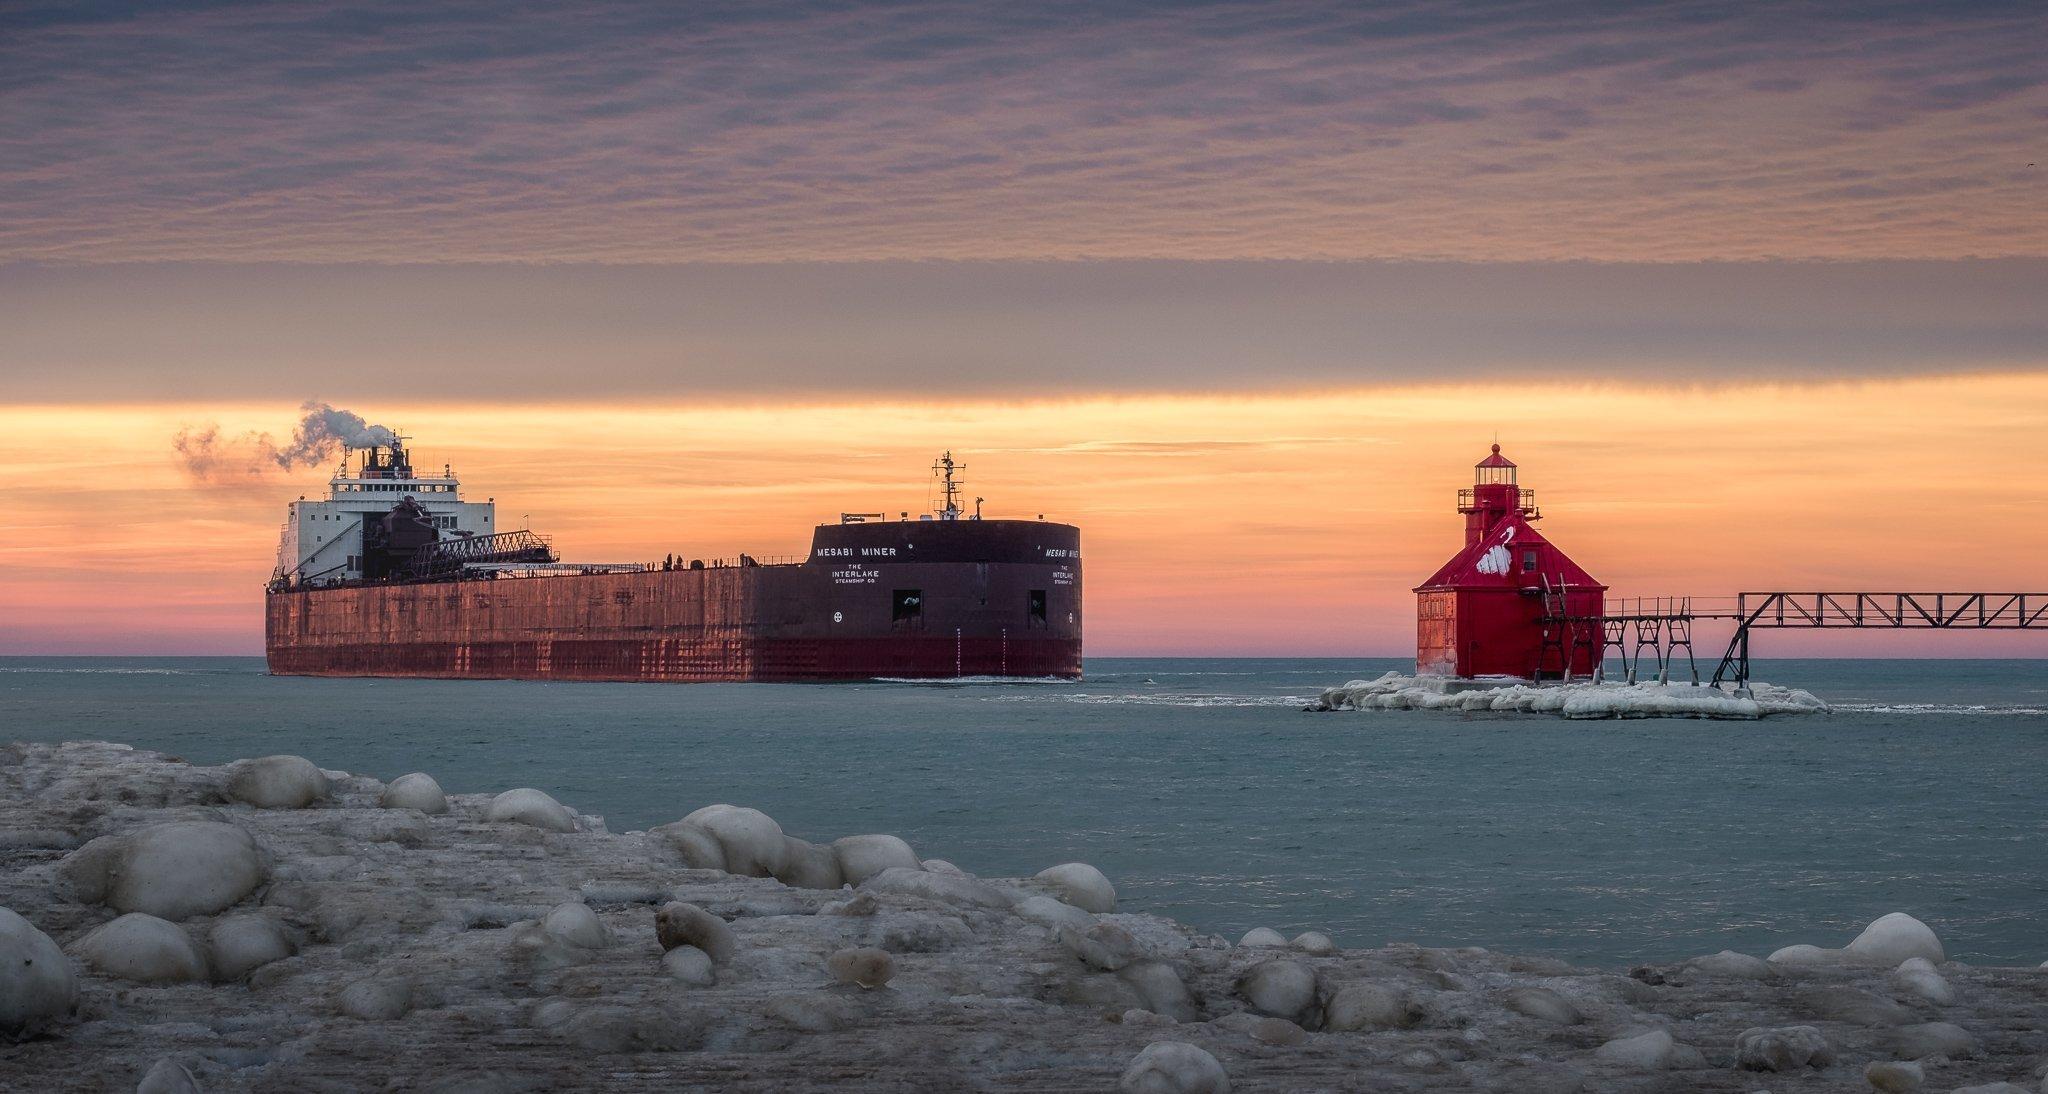 sturgeon bay winter fleet schedule, great lakes, freighter, fincantieri bay shipbuilding, bay shipbuilding